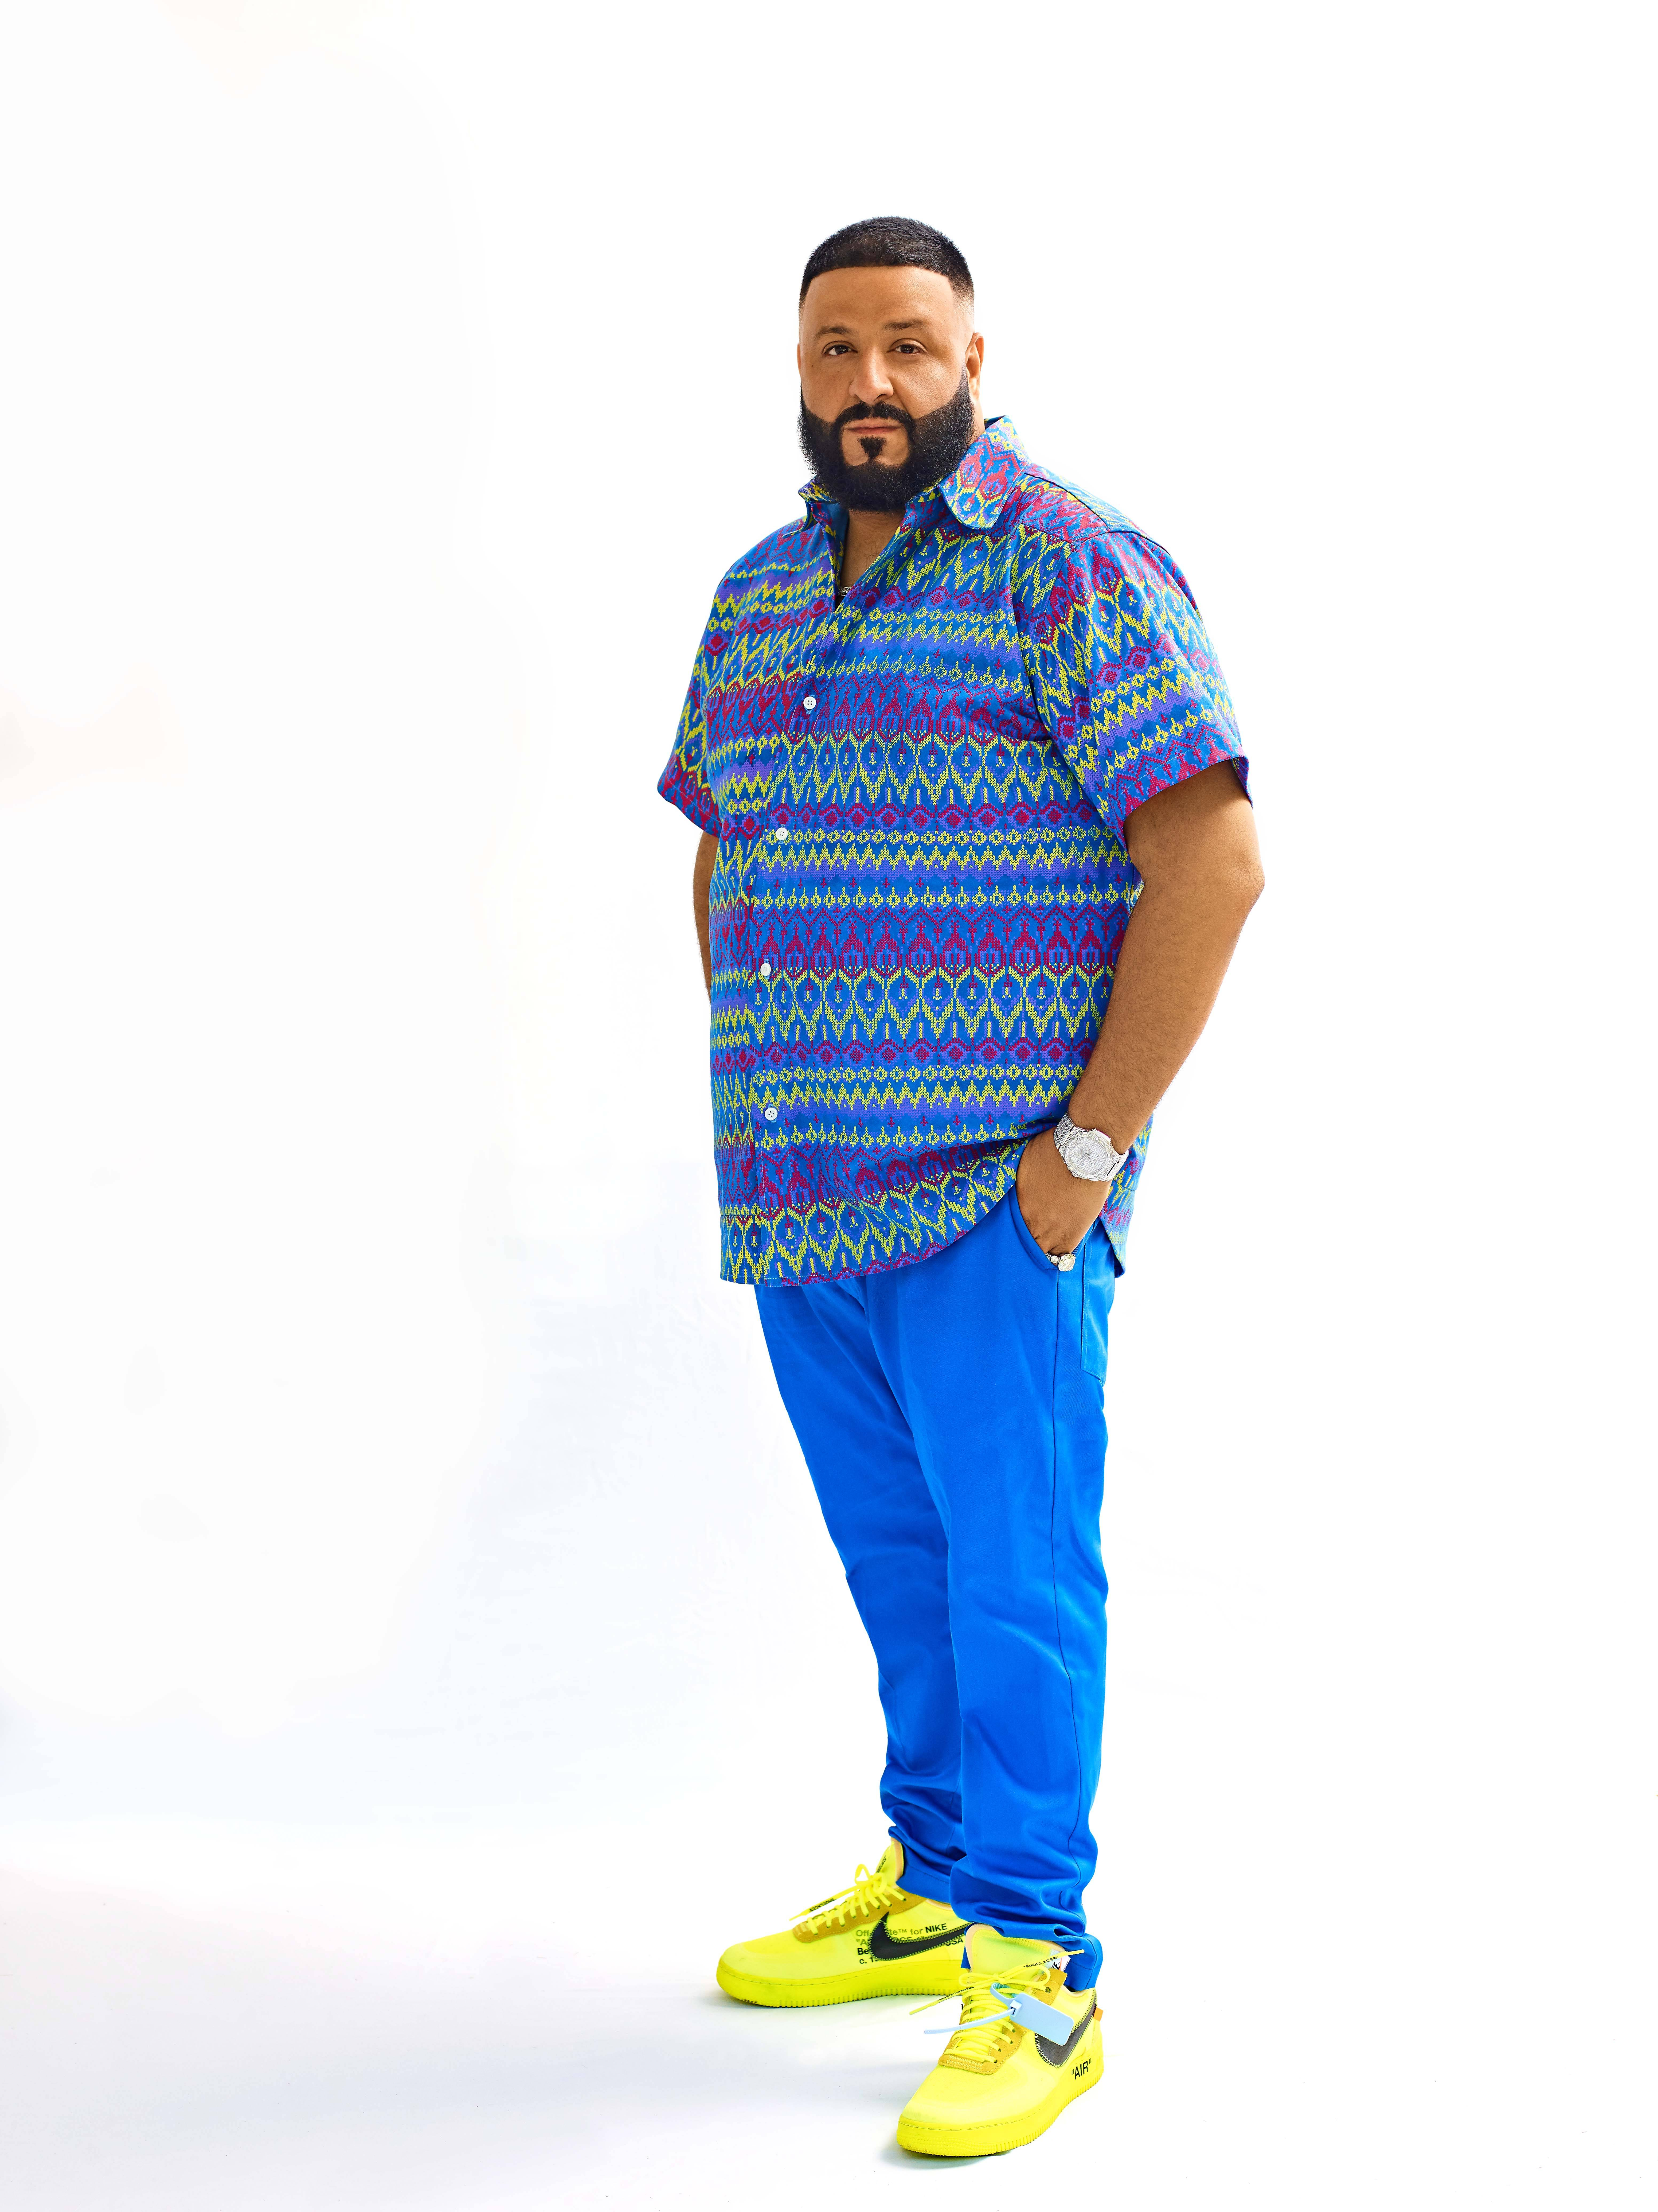 Producer DJ Khaled - (Photo Credit: Jonathan Mannion)